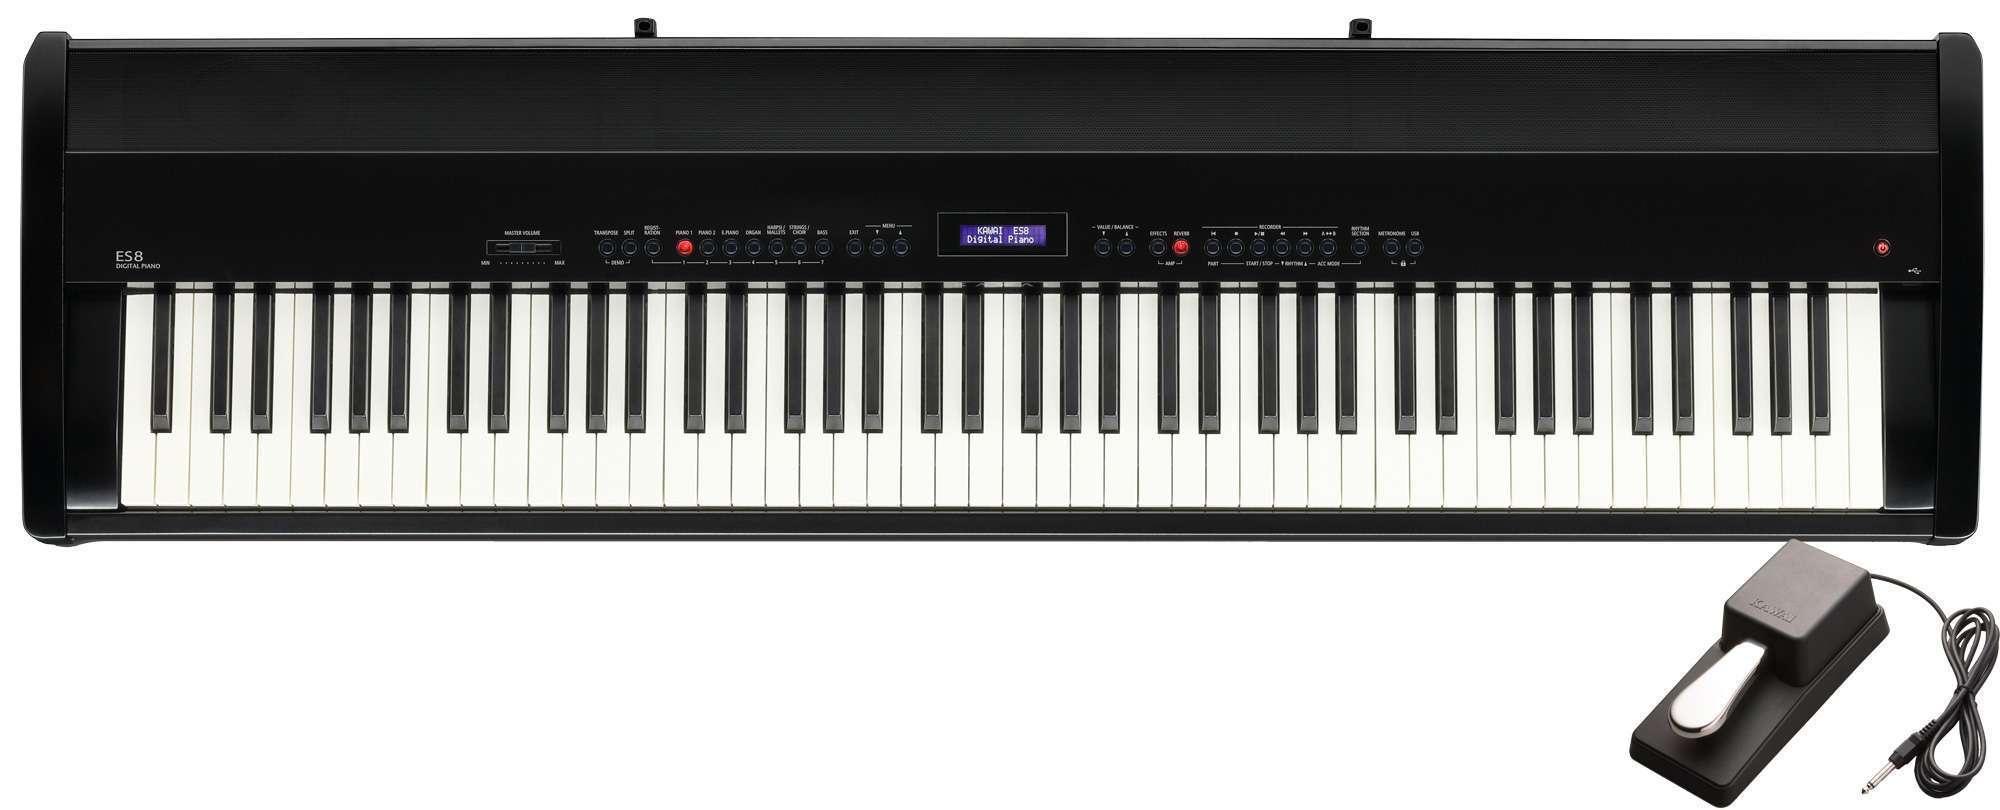 Kawai ES8 Black Digital Piano